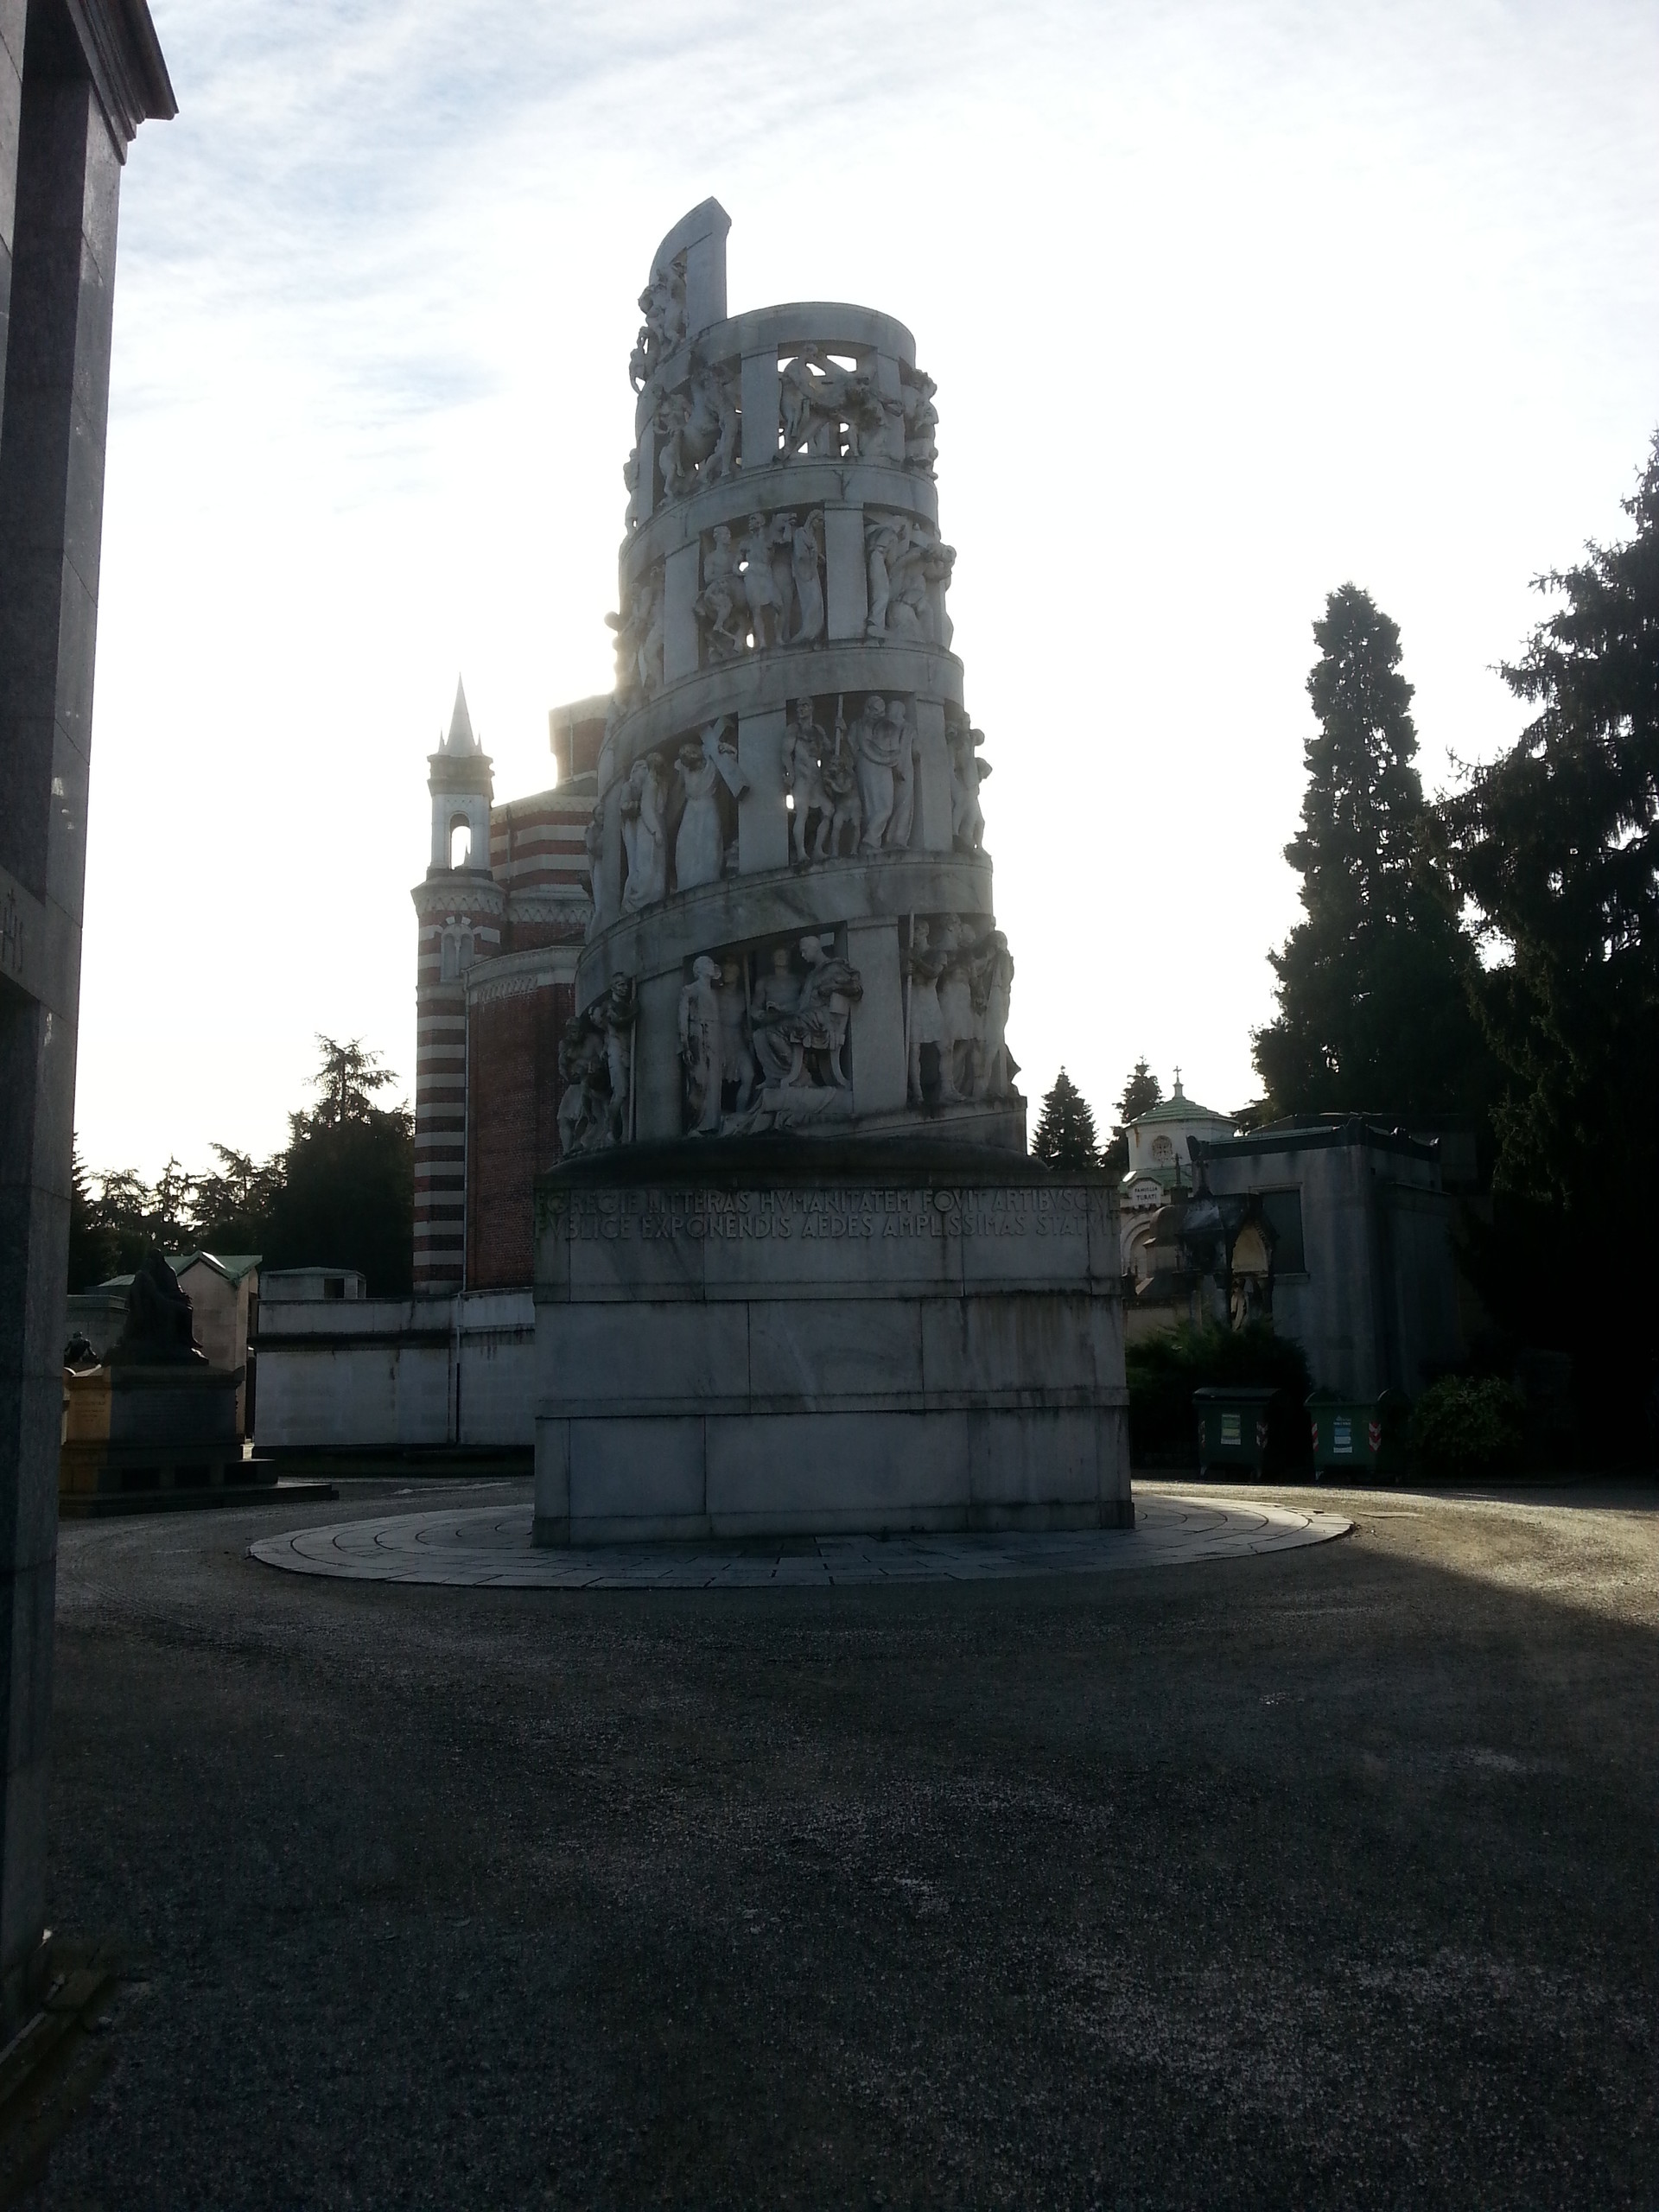 cementerio-monumental-3e4c72cc9feba6b29c